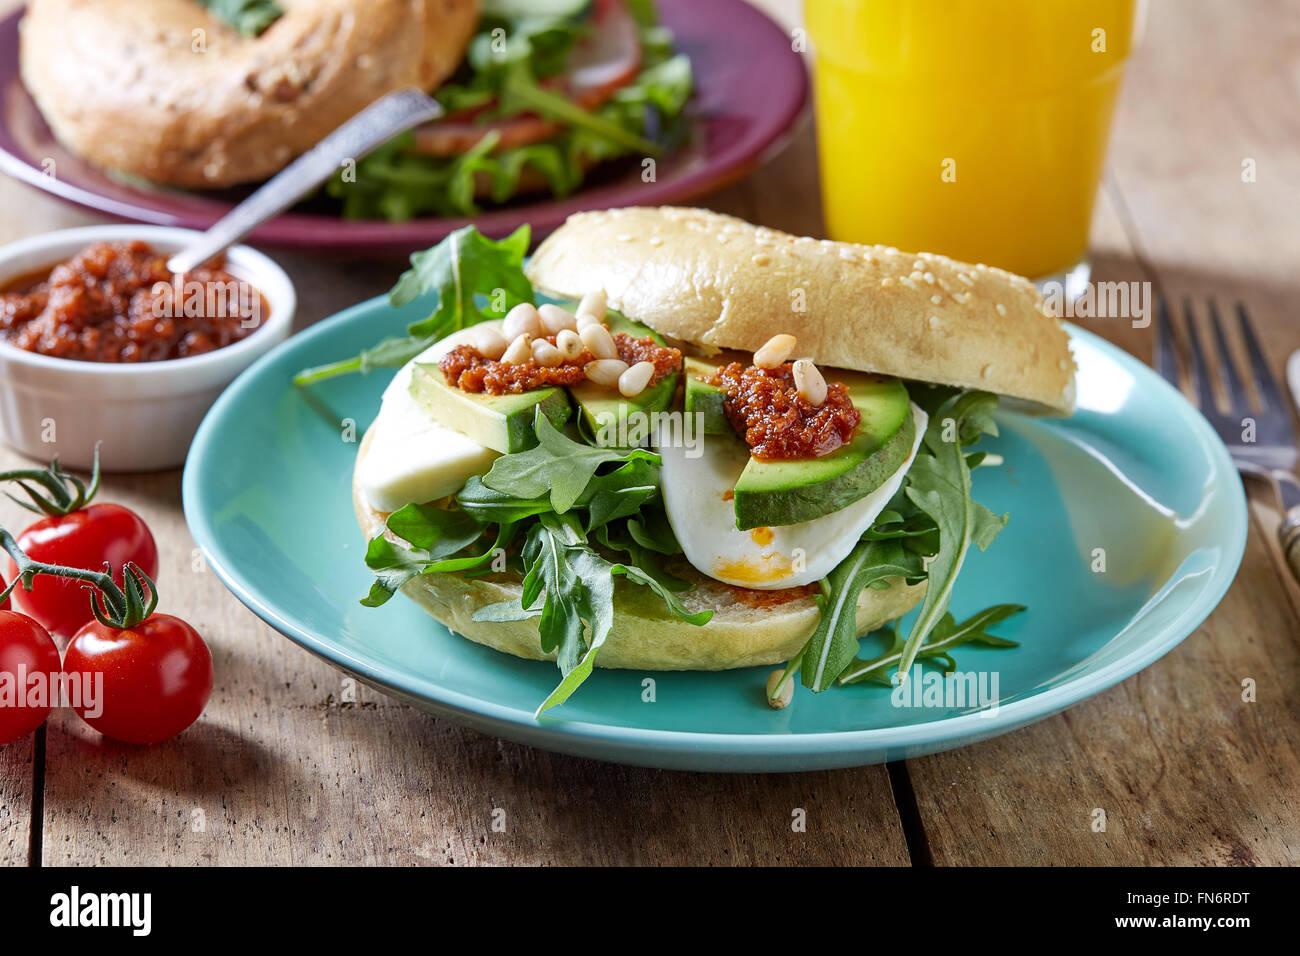 Fresh bagel sandwich on wooden table - Stock Image